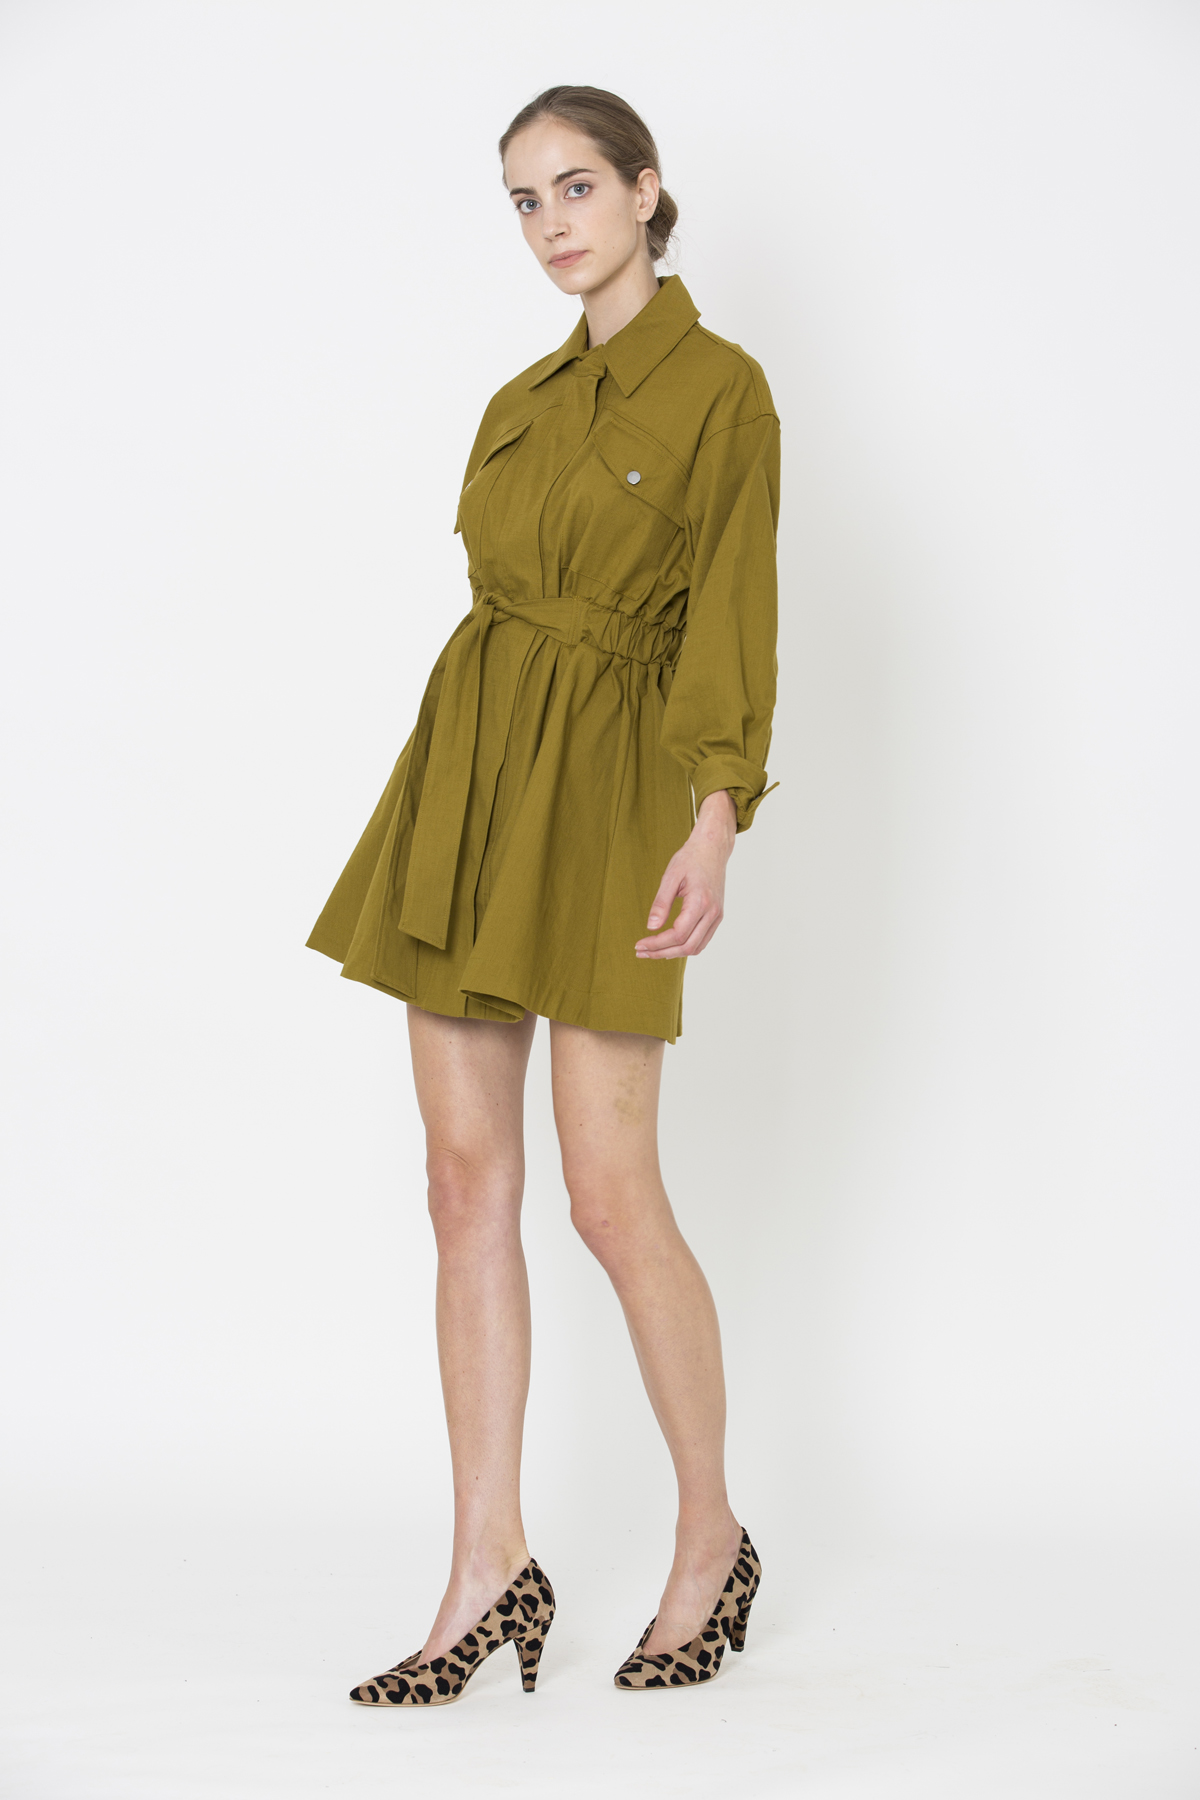 oden-olive-dress-trench-shirt-collar-bash-cotton-matchboxathens